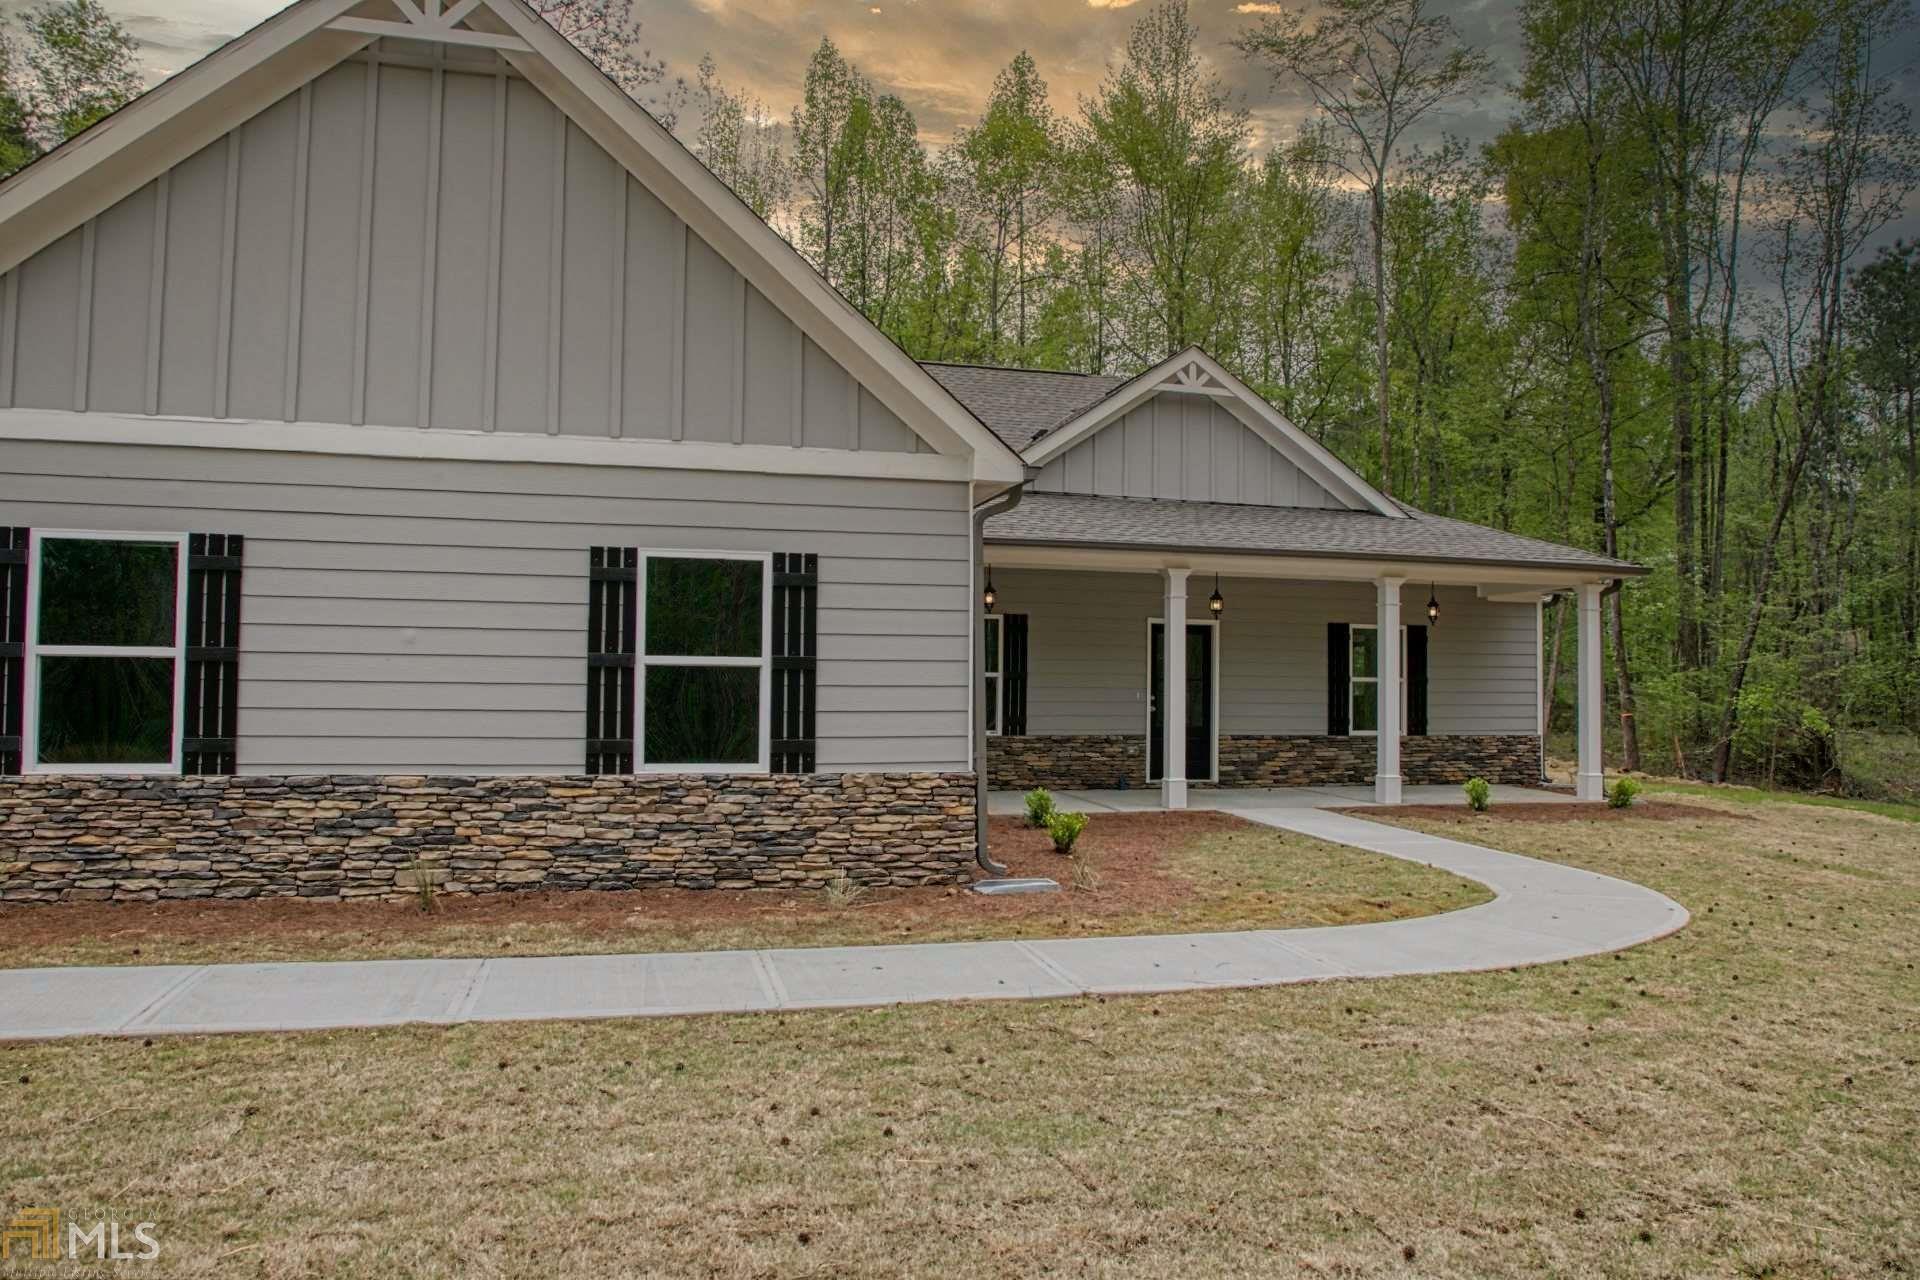 111 Water Oak Dr, Monticello, GA 31064 - MLS#: 8942533